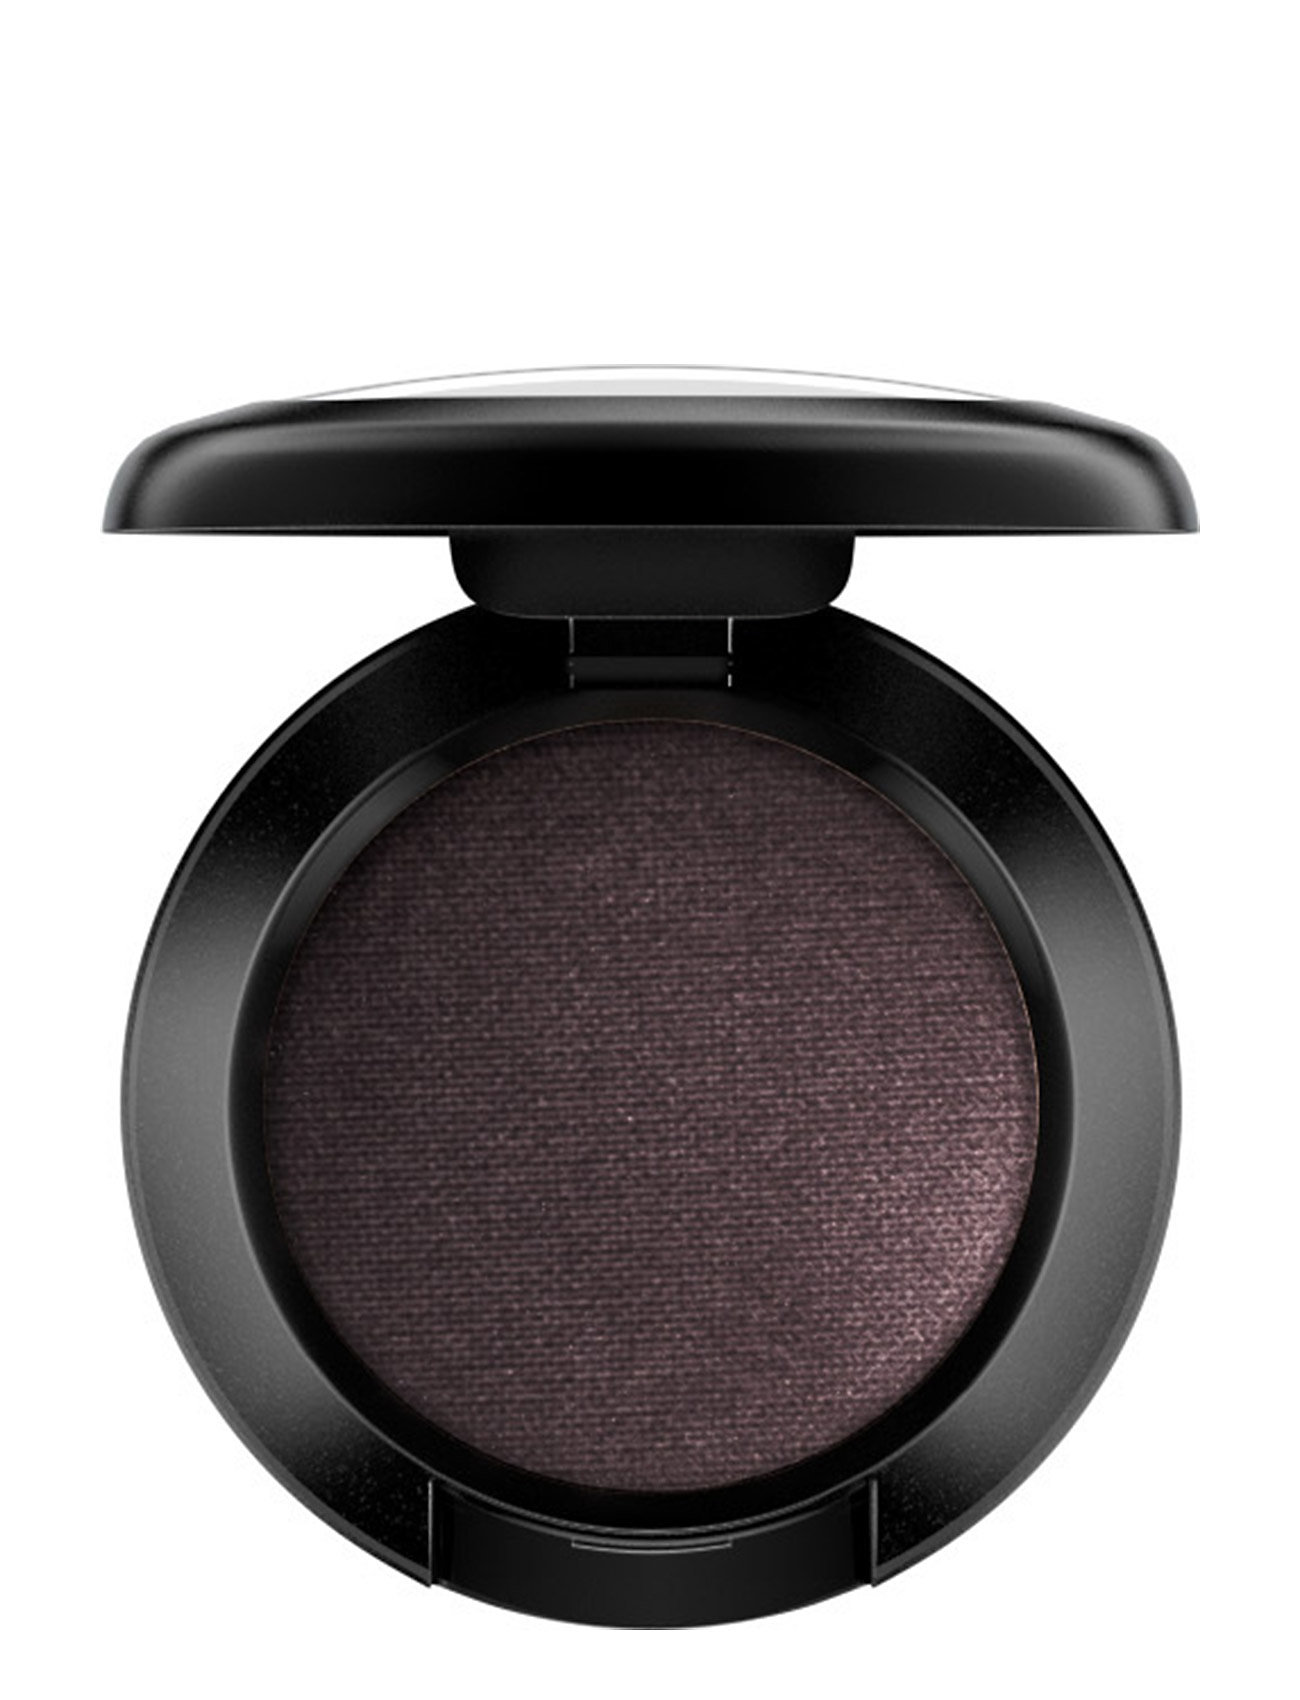 Image of Velvet Smut Beauty WOMEN Makeup Eyes Eyeshadow - Not Palettes Lilla M.A.C. (3345194481)